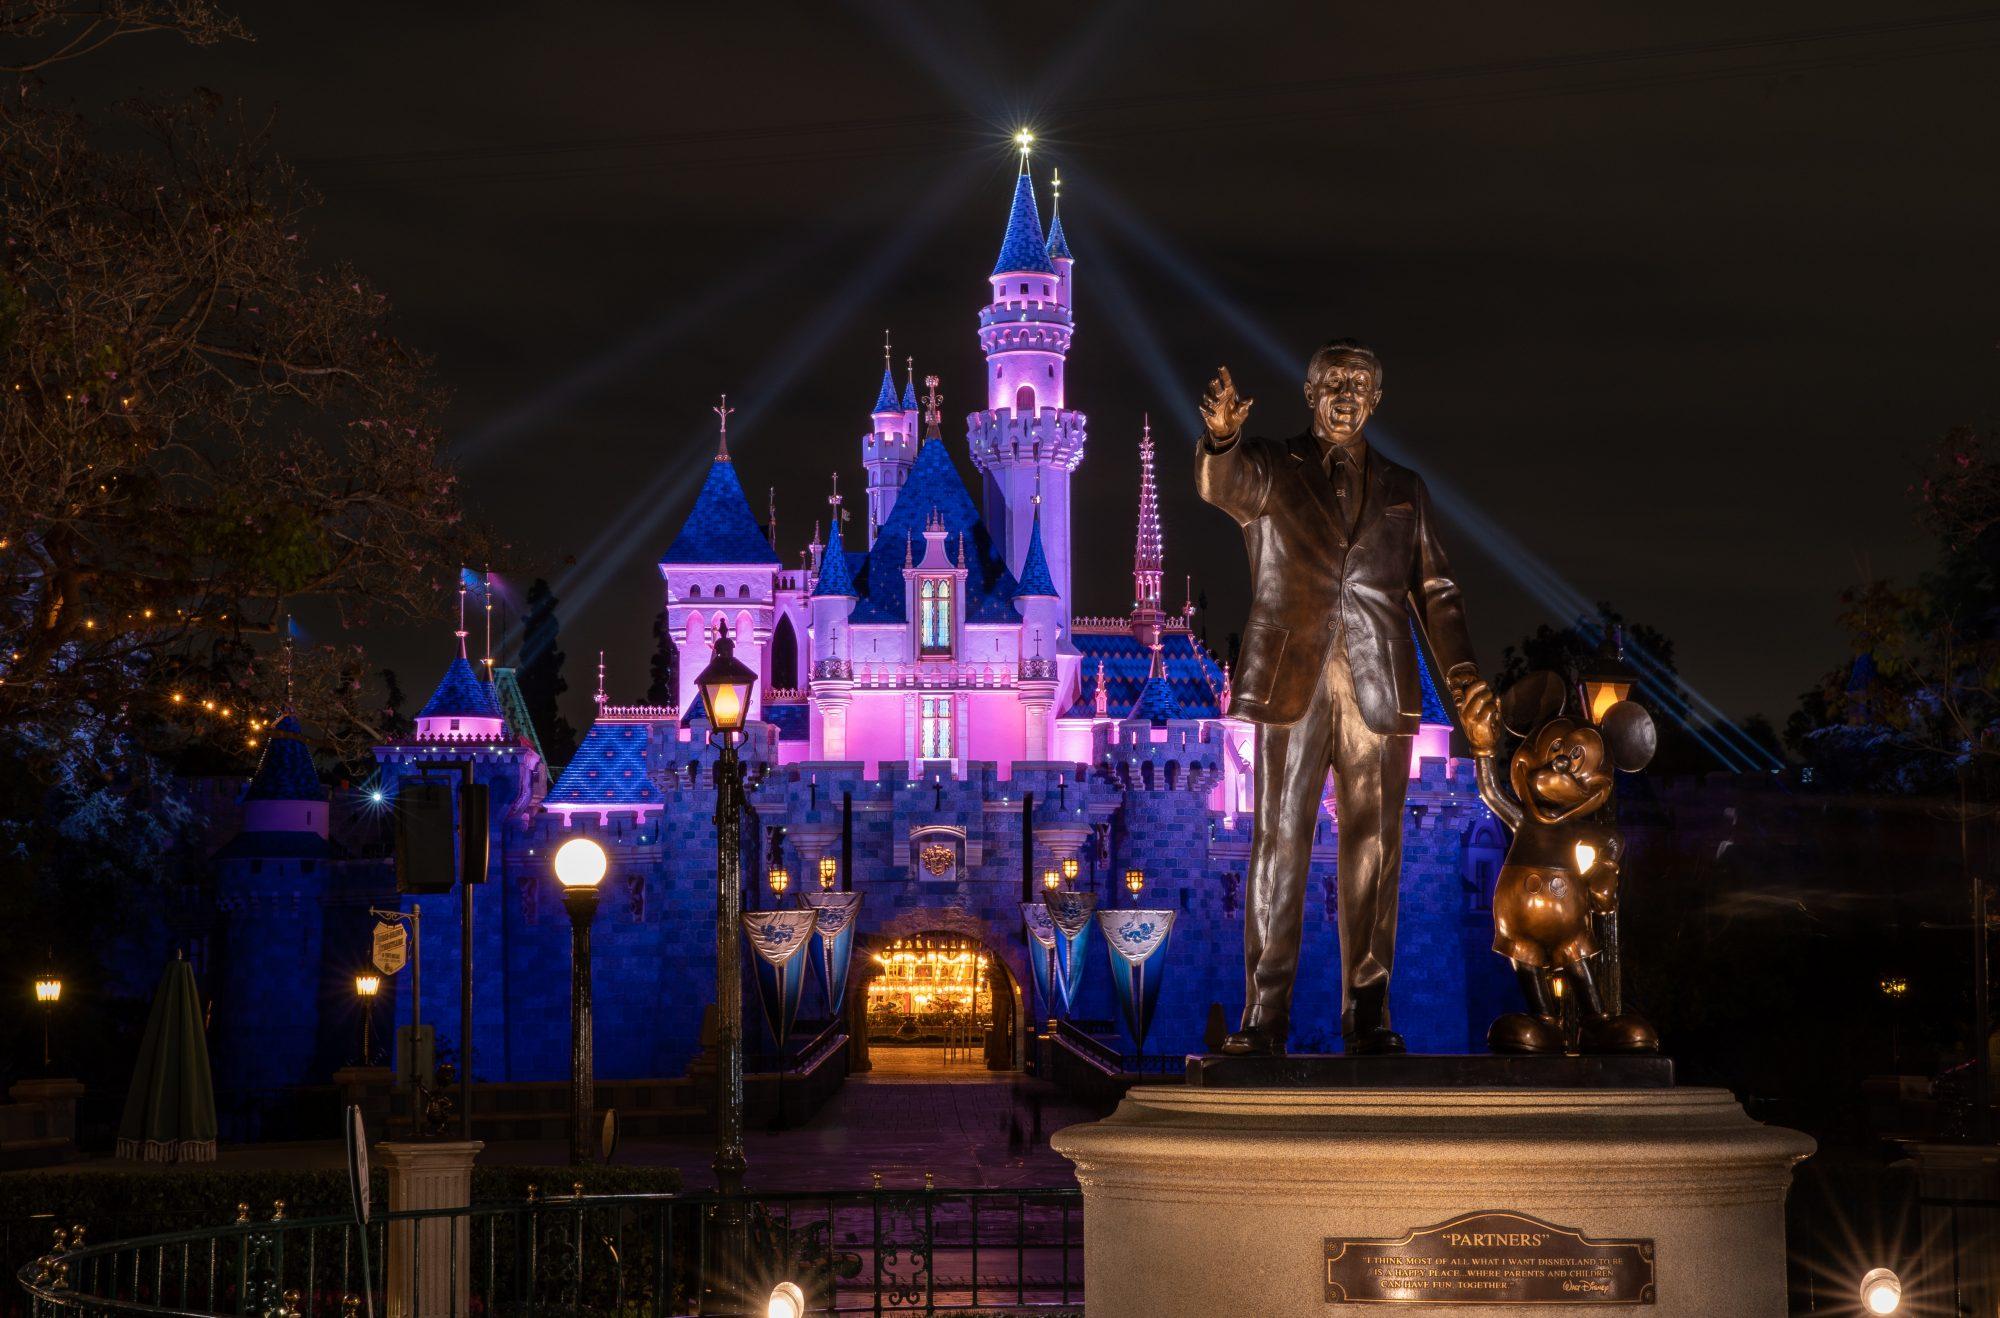 Watch the Magical Moment Disneyland Lights Up Sleeping Beauty Castle After a Year-Long Shutdown